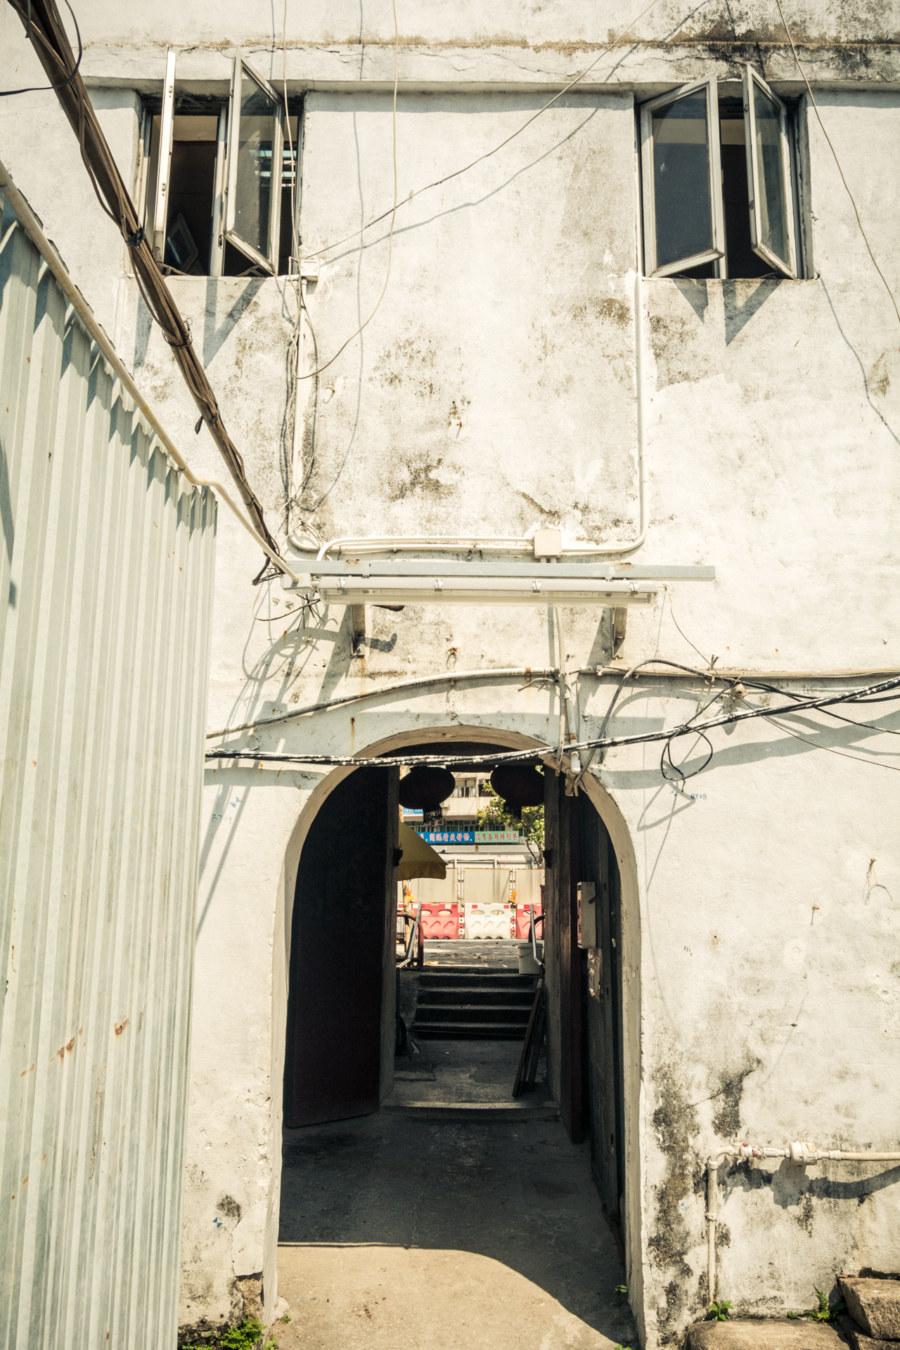 Inside the walled village of Nga Tsin Wai